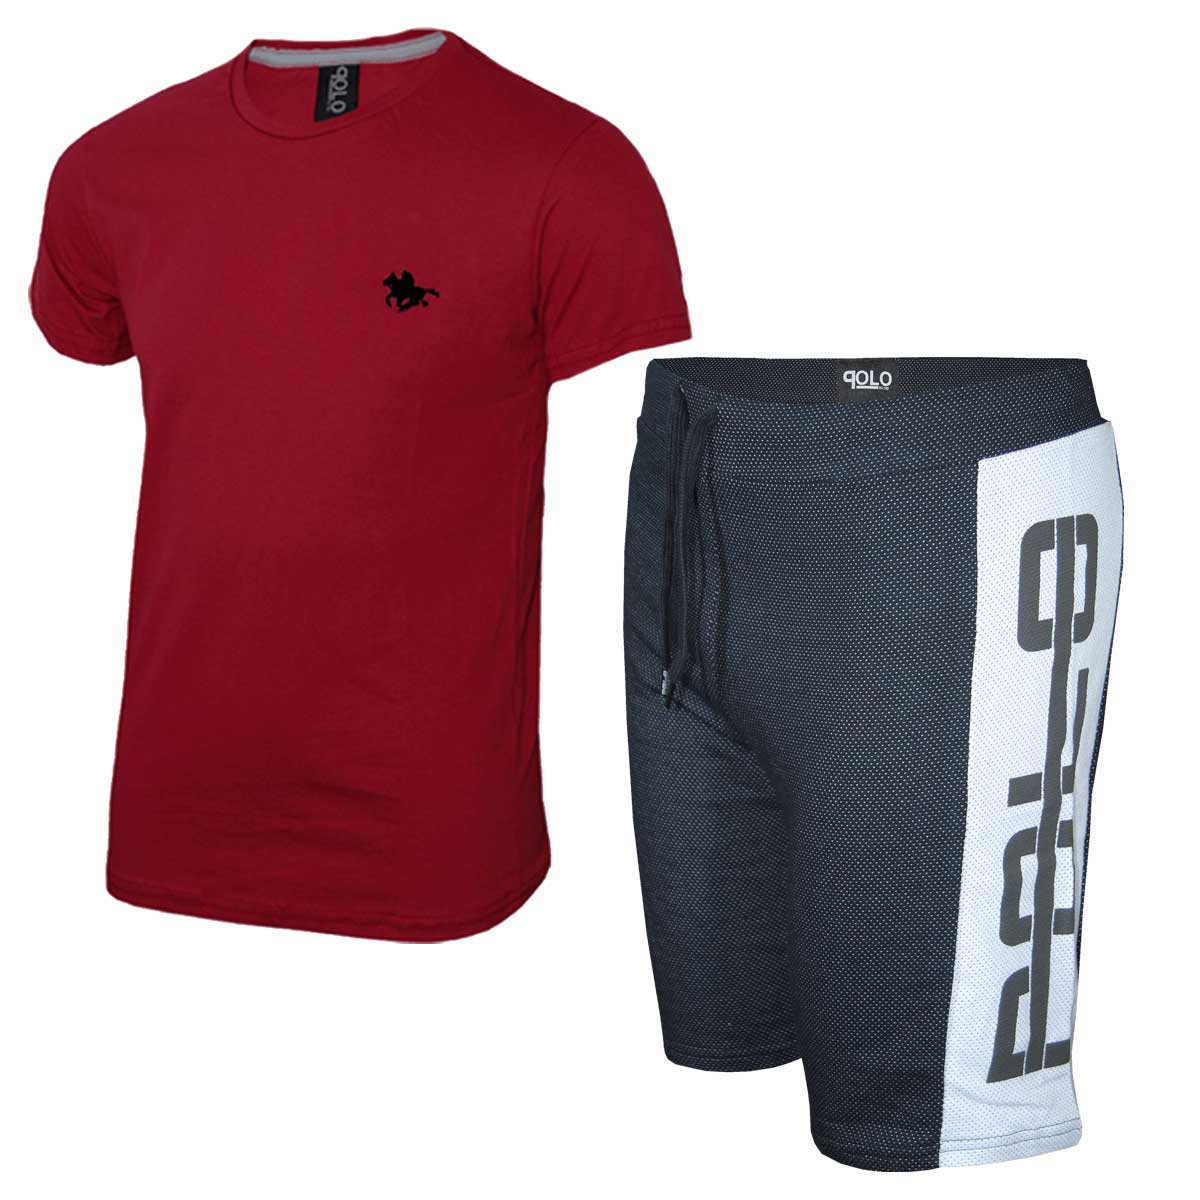 Kit Camiseta Vermelha e Bermuda Preta Polo RG518